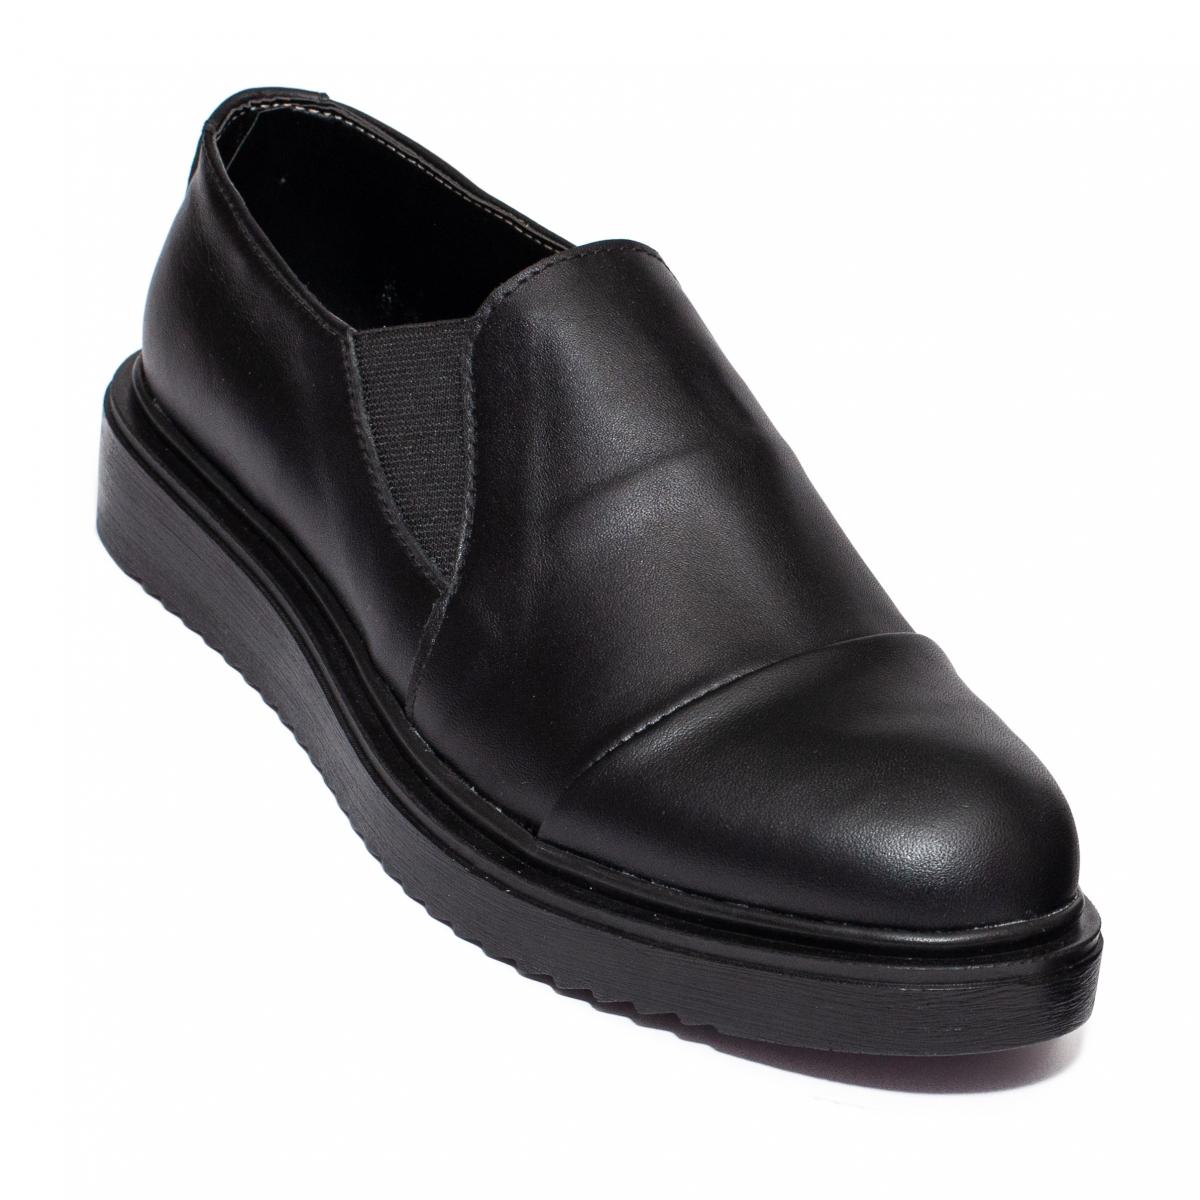 Pantofi dama piele DC55 negru box 34-41